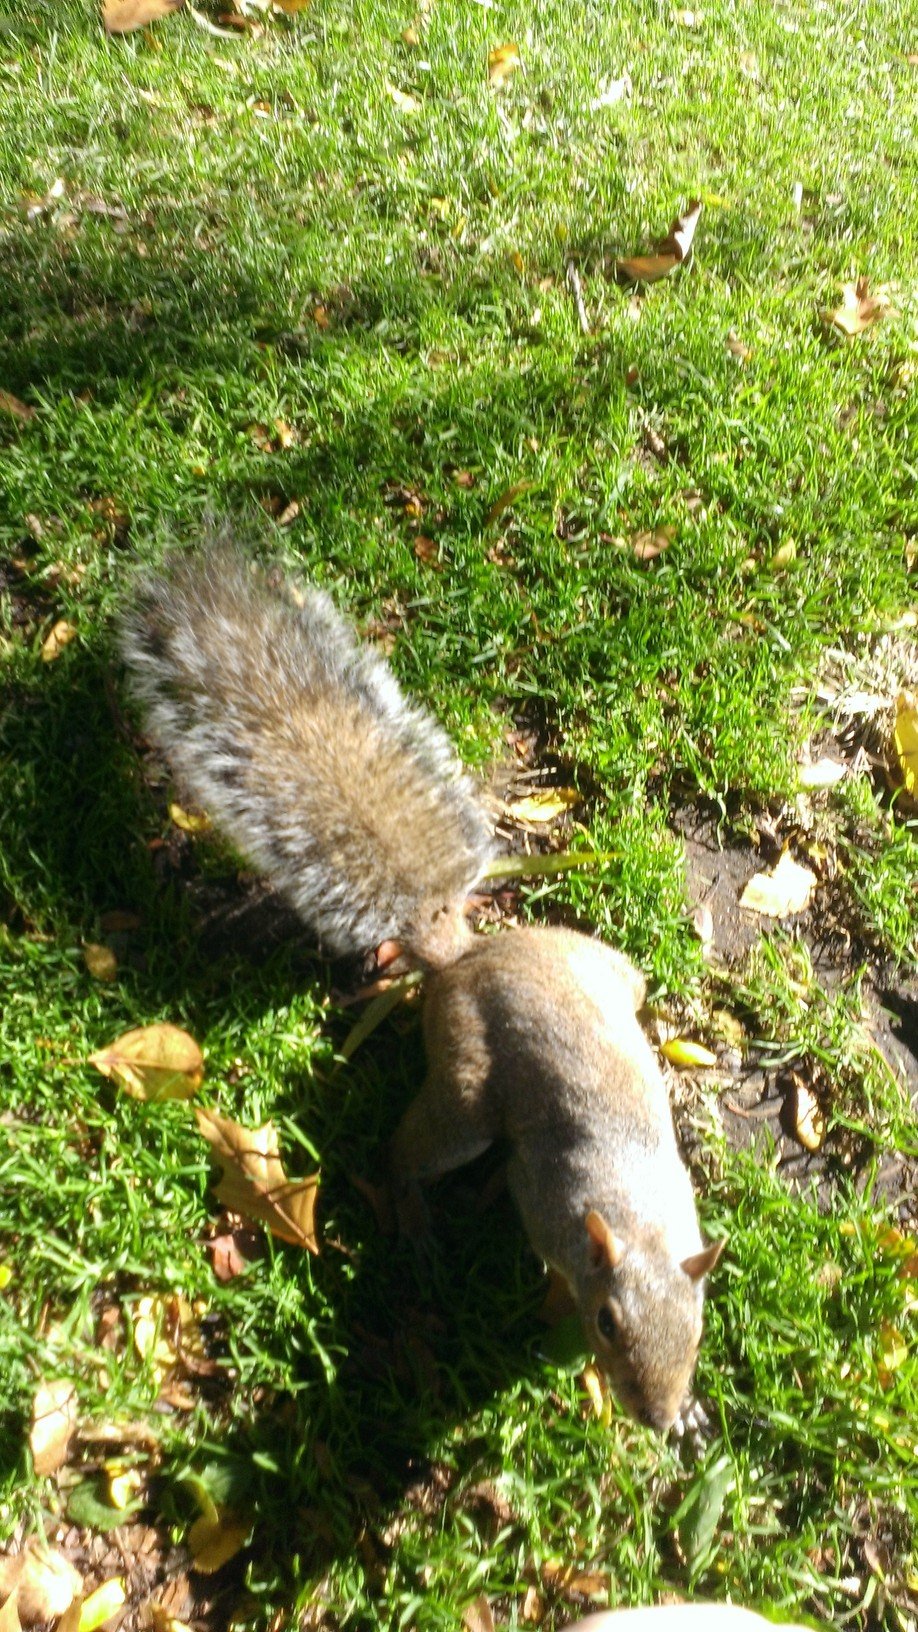 Boston squirrel